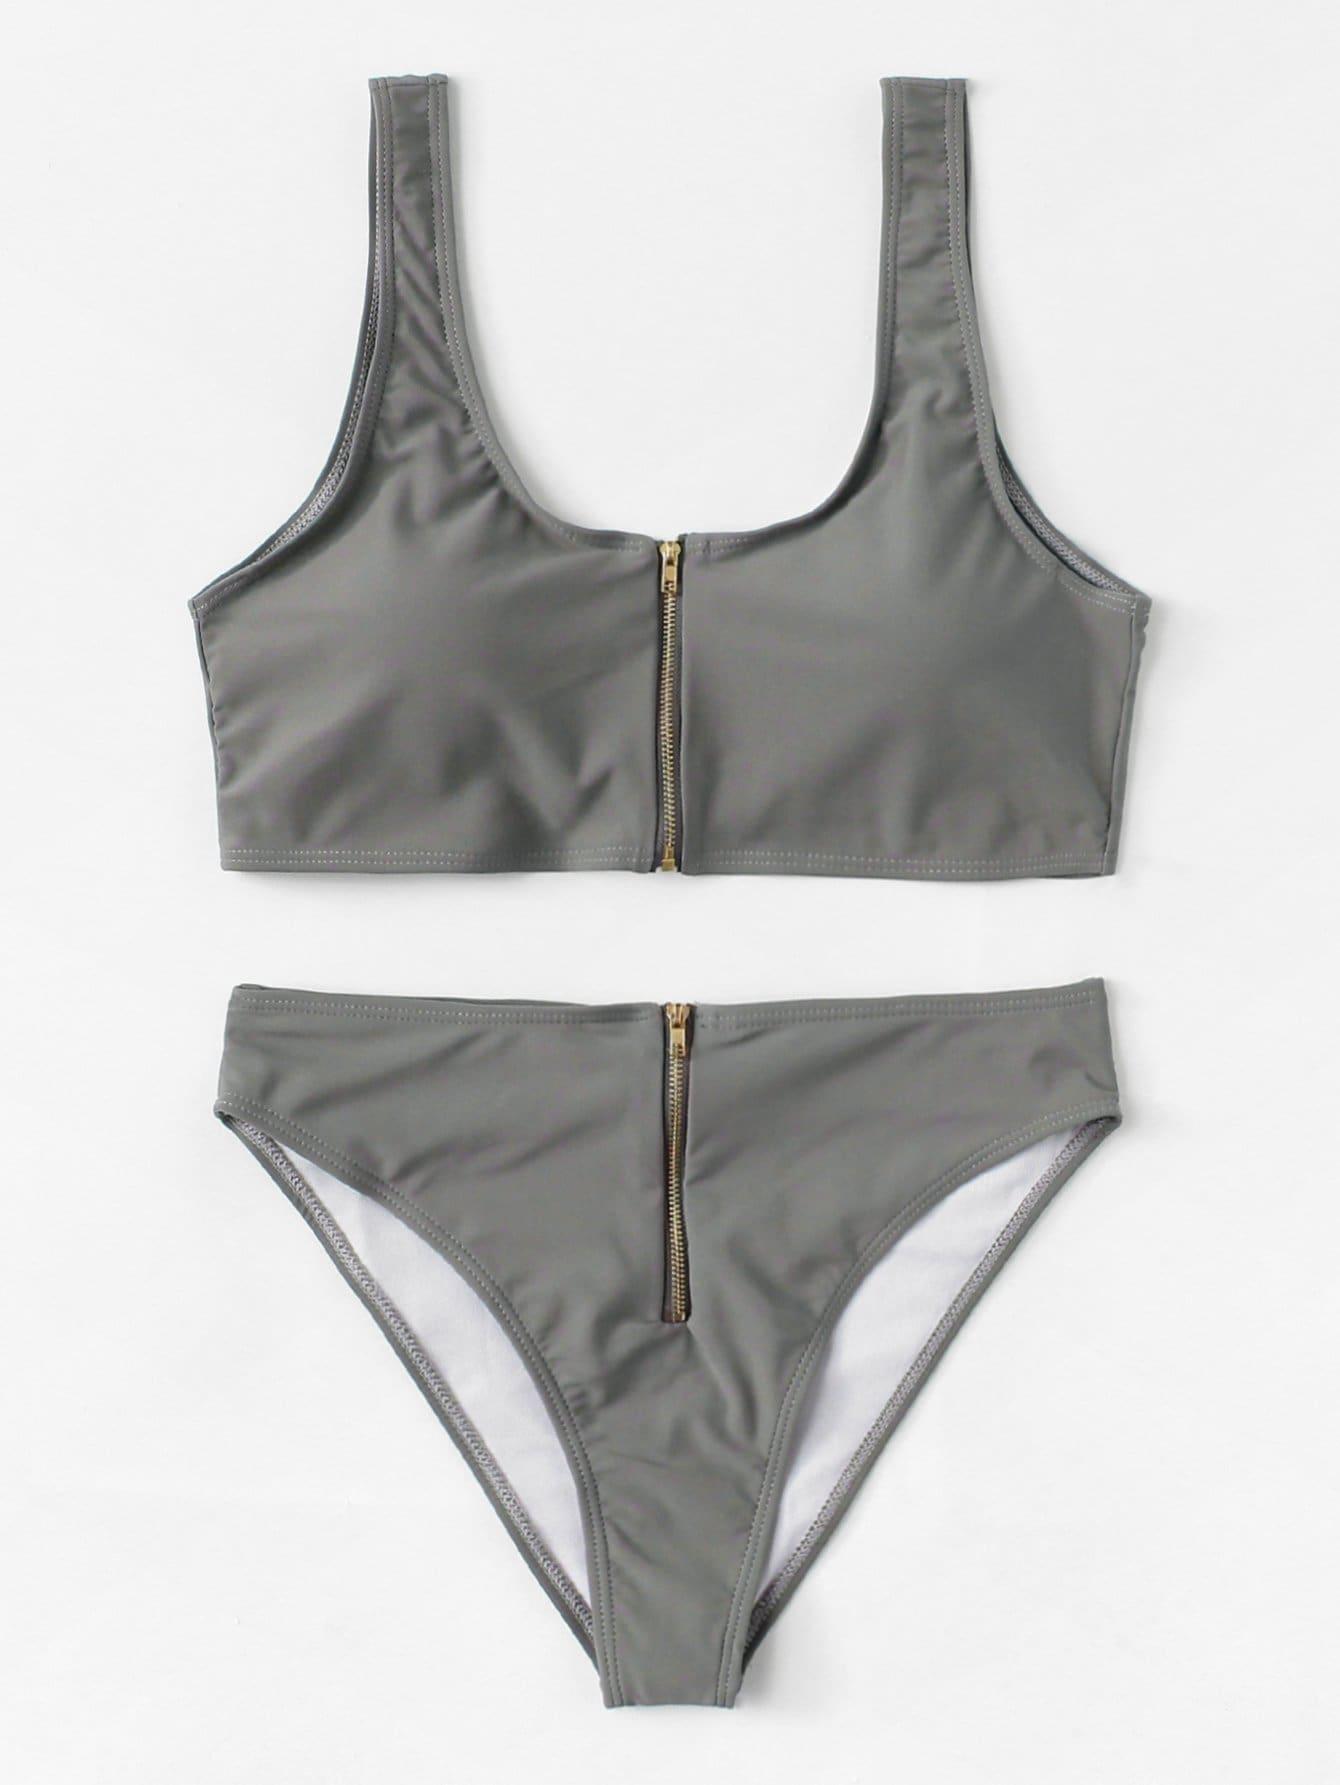 Zipper Front Plain Bikini Set zipper front plain bikini set